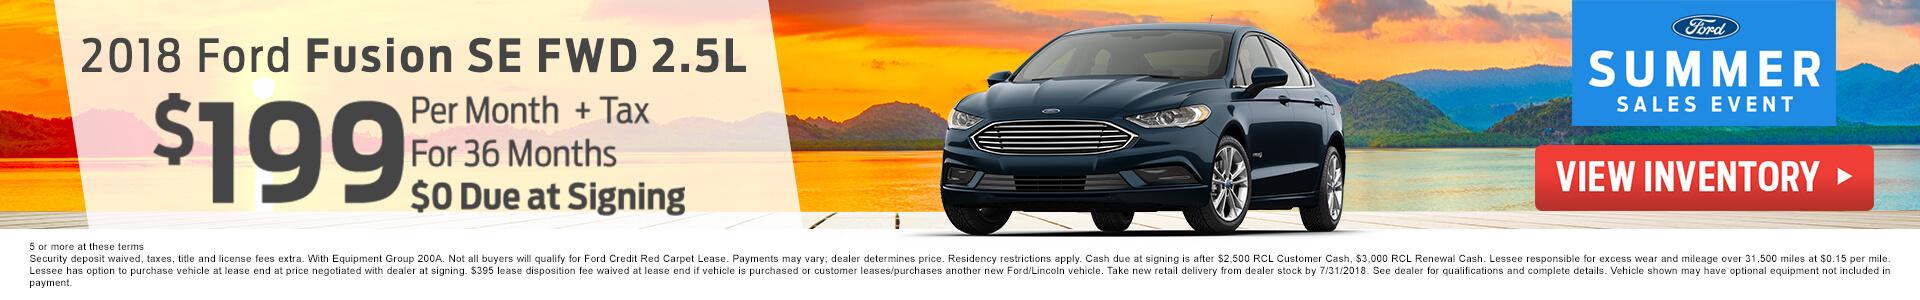 Ford Fusion SE $169